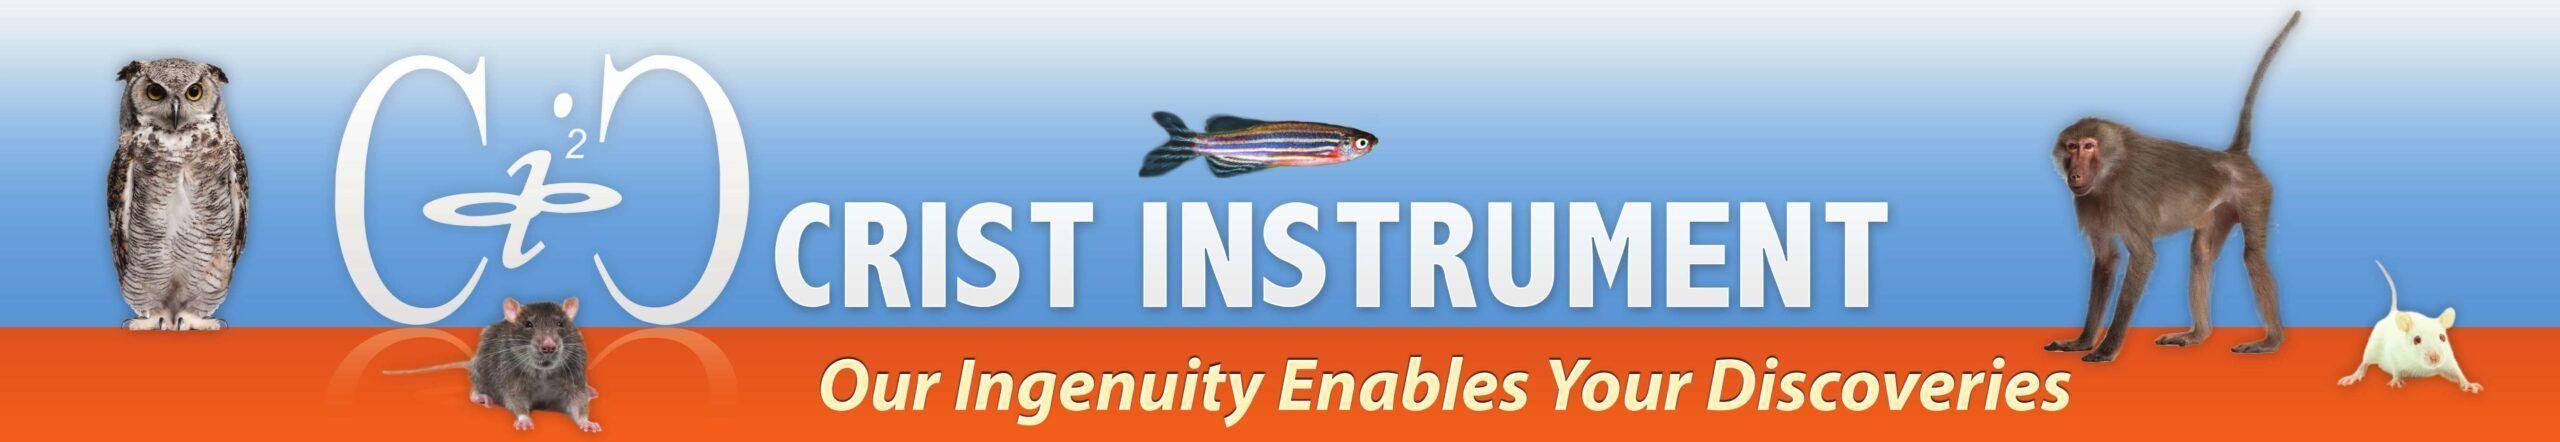 Crist Instrument Co., Inc.